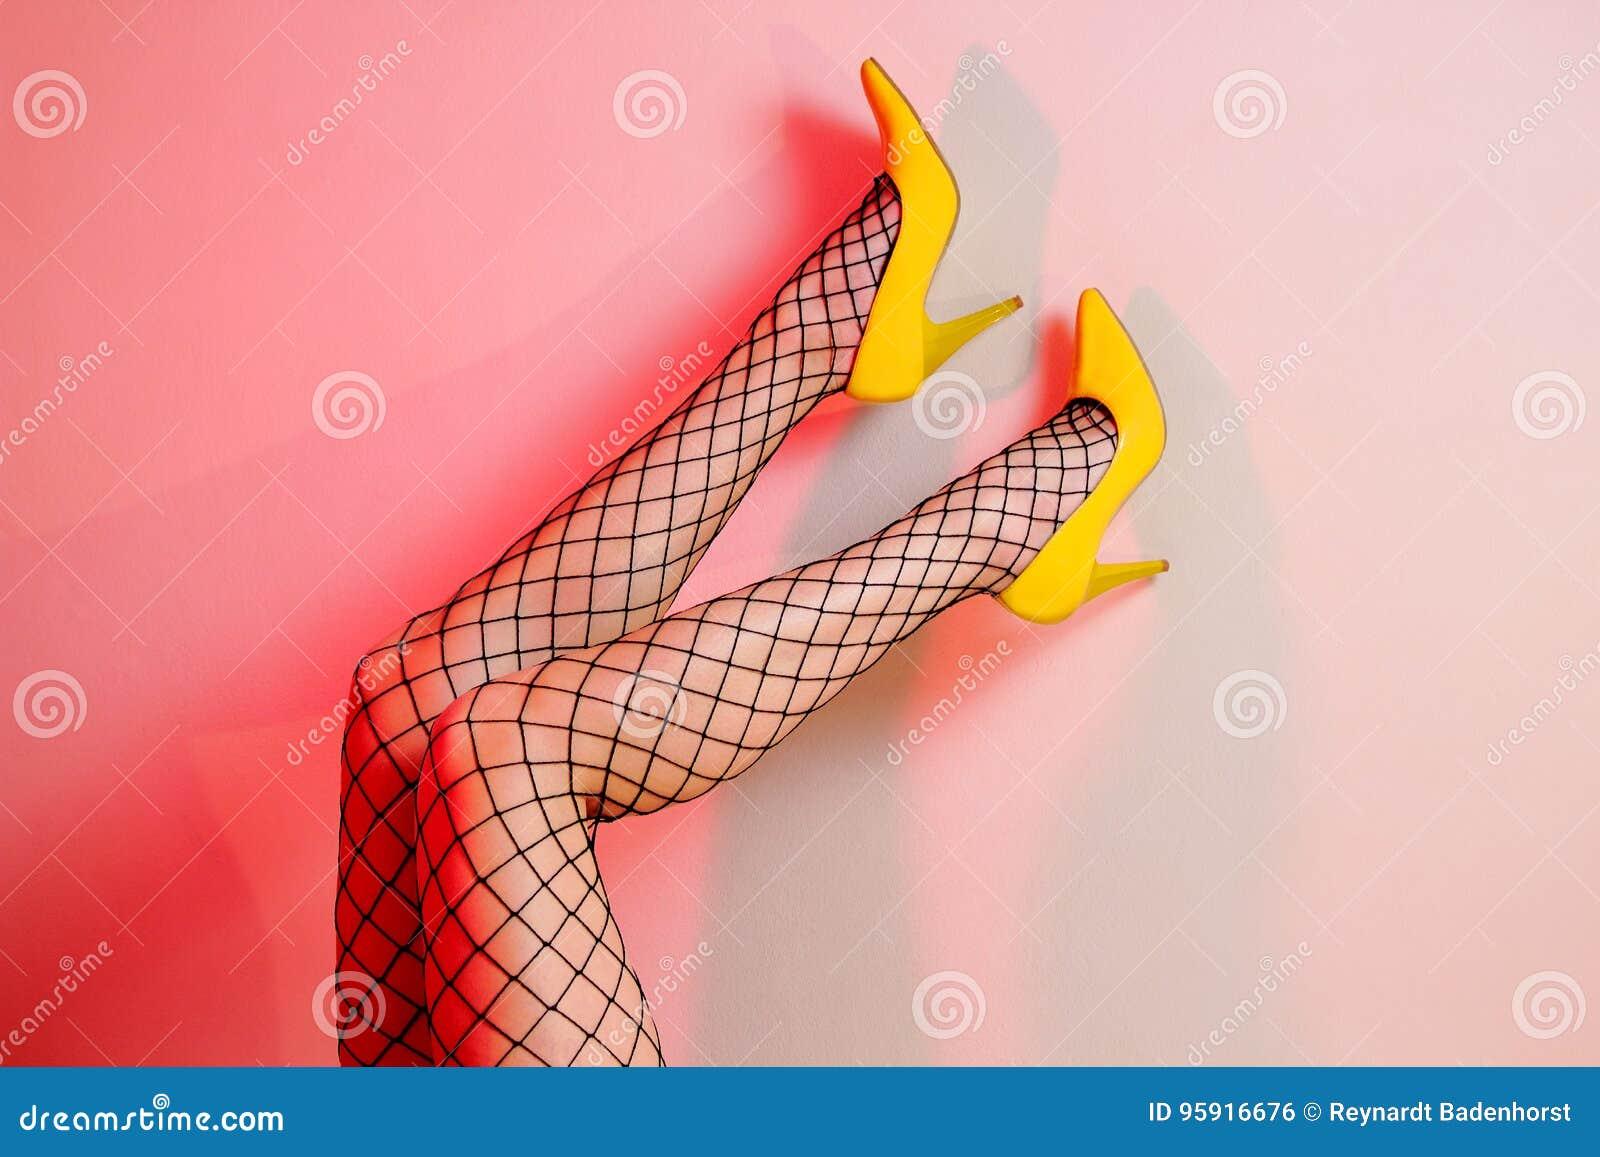 6add1828333 Woman's Legs In Fishnet Tights Stock Photo - Image of weak, fishnet ...